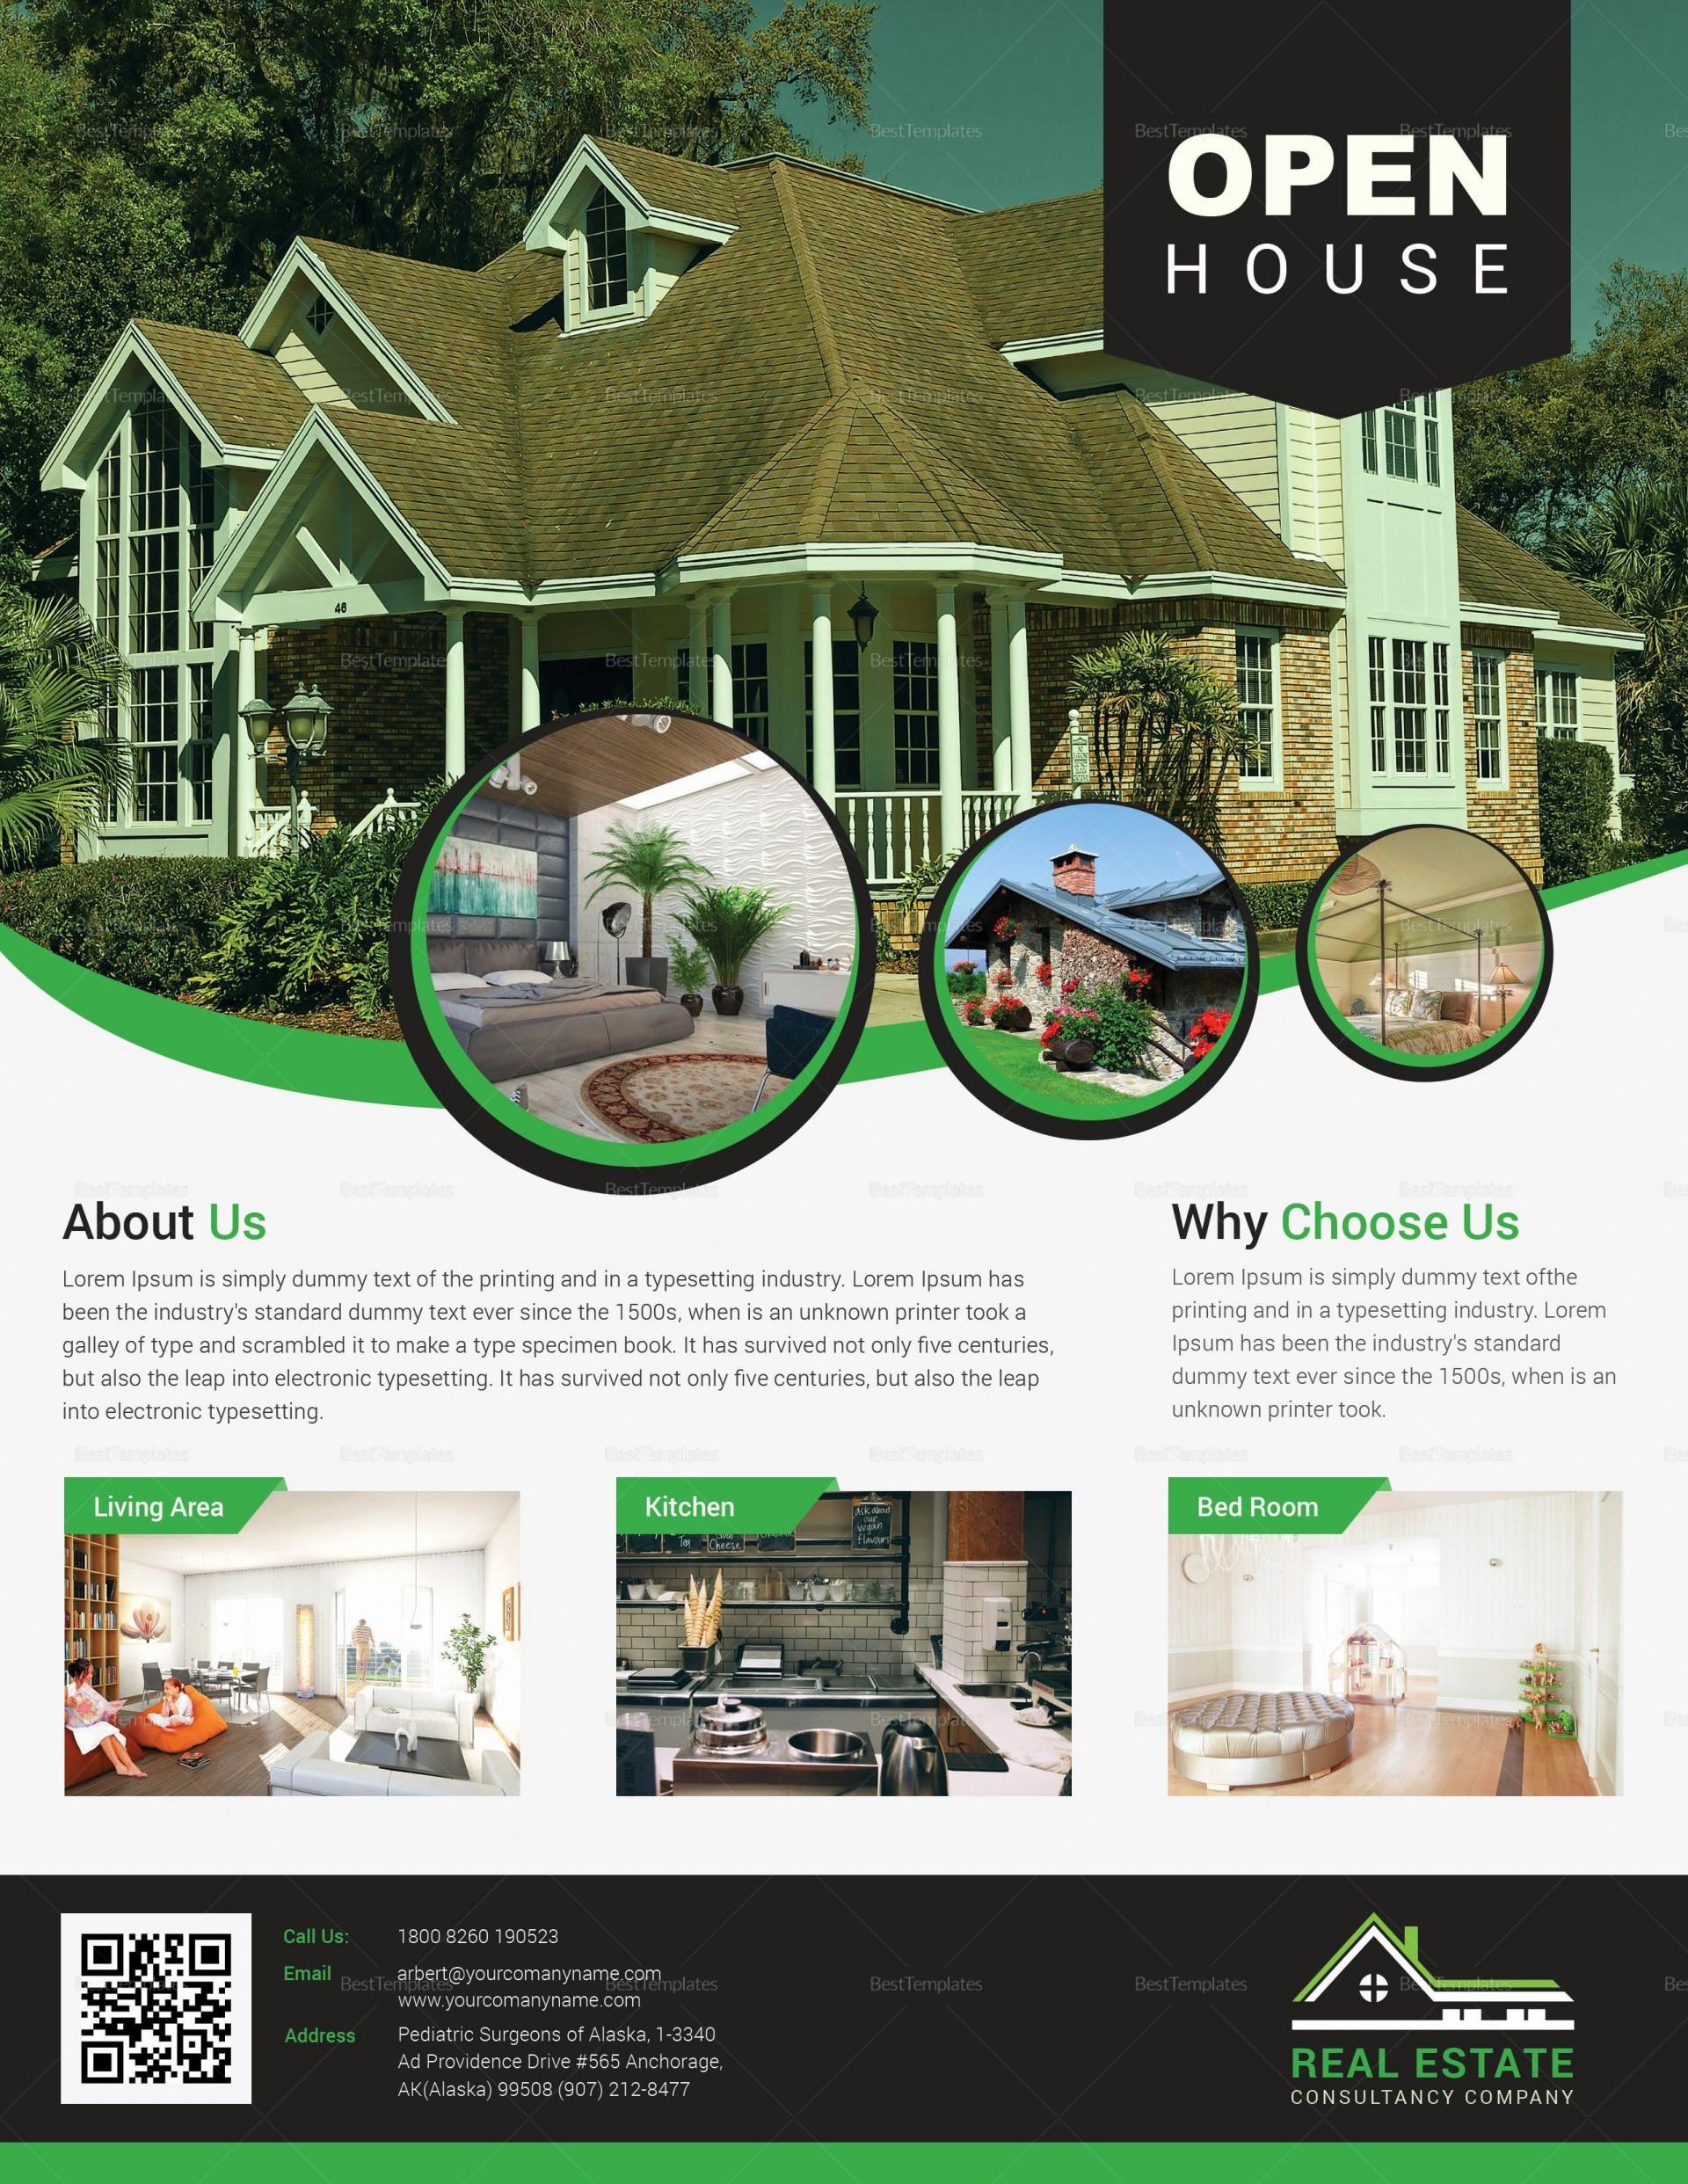 000 Astounding Open House Flyer Template Free Picture  School Microsoft Word Preschool1920